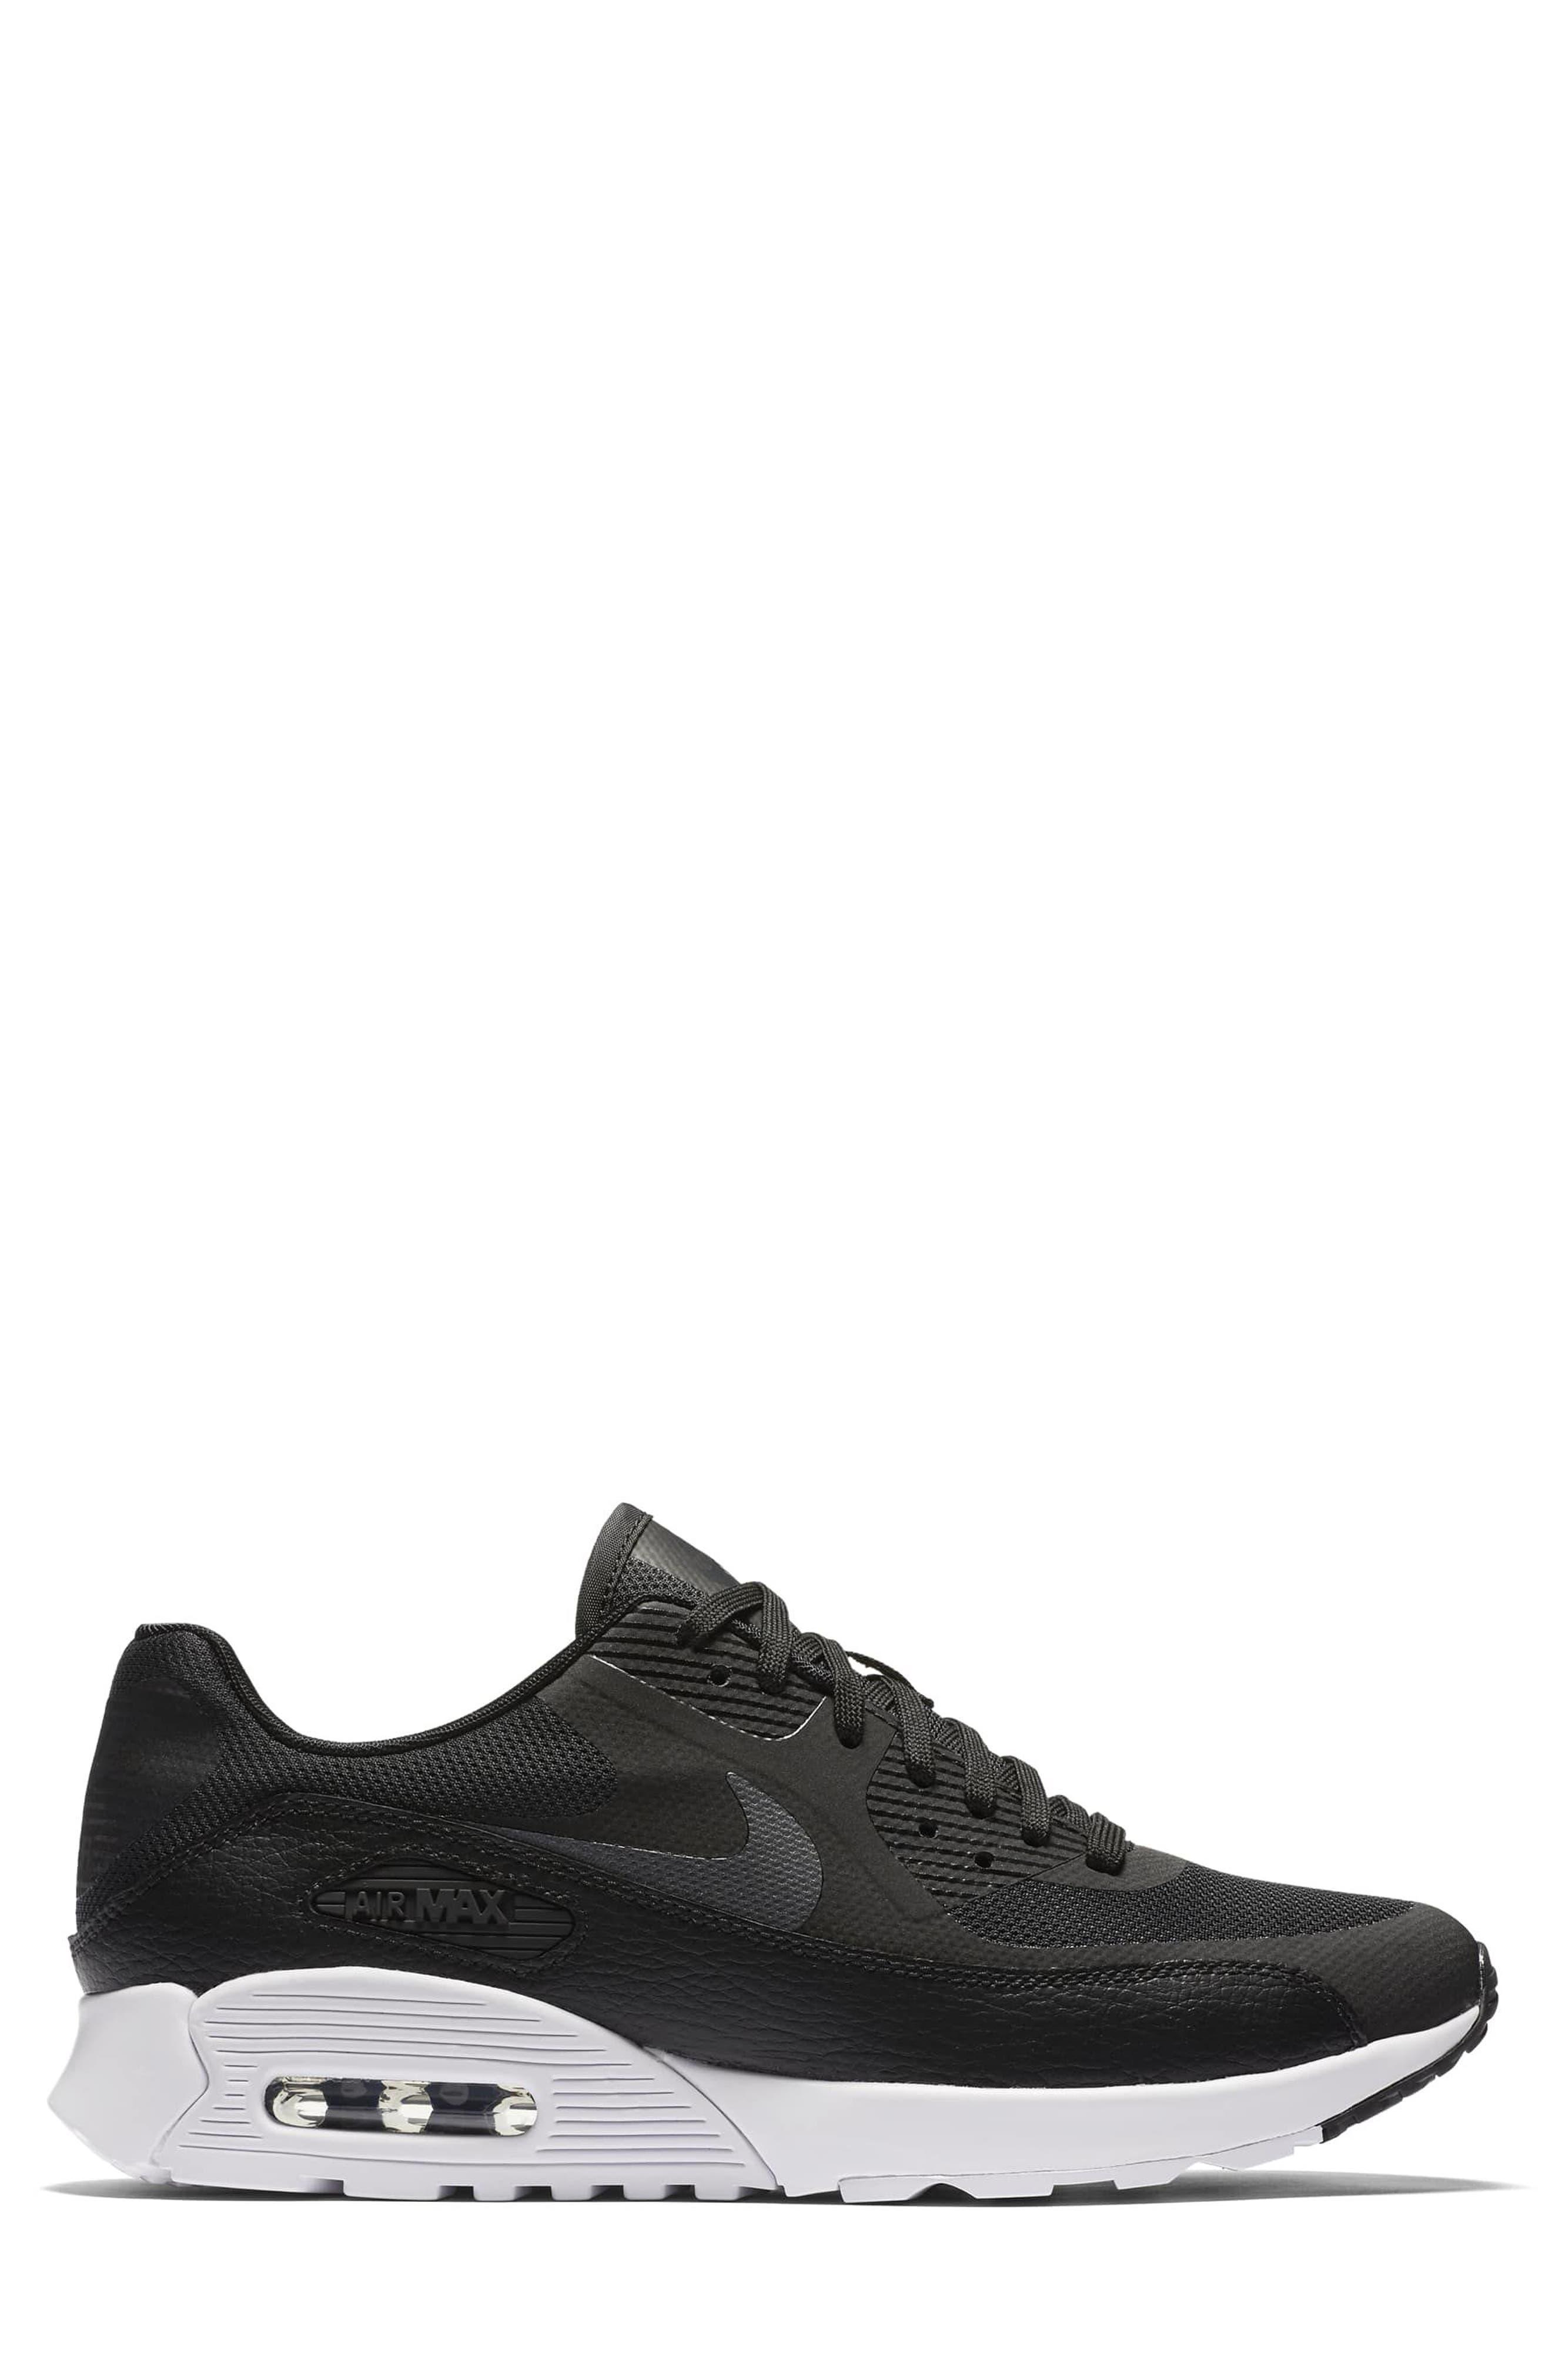 Air Max 90 Ultra 2.0 Sneaker,                             Alternate thumbnail 2, color,                             Black/ White/ Black